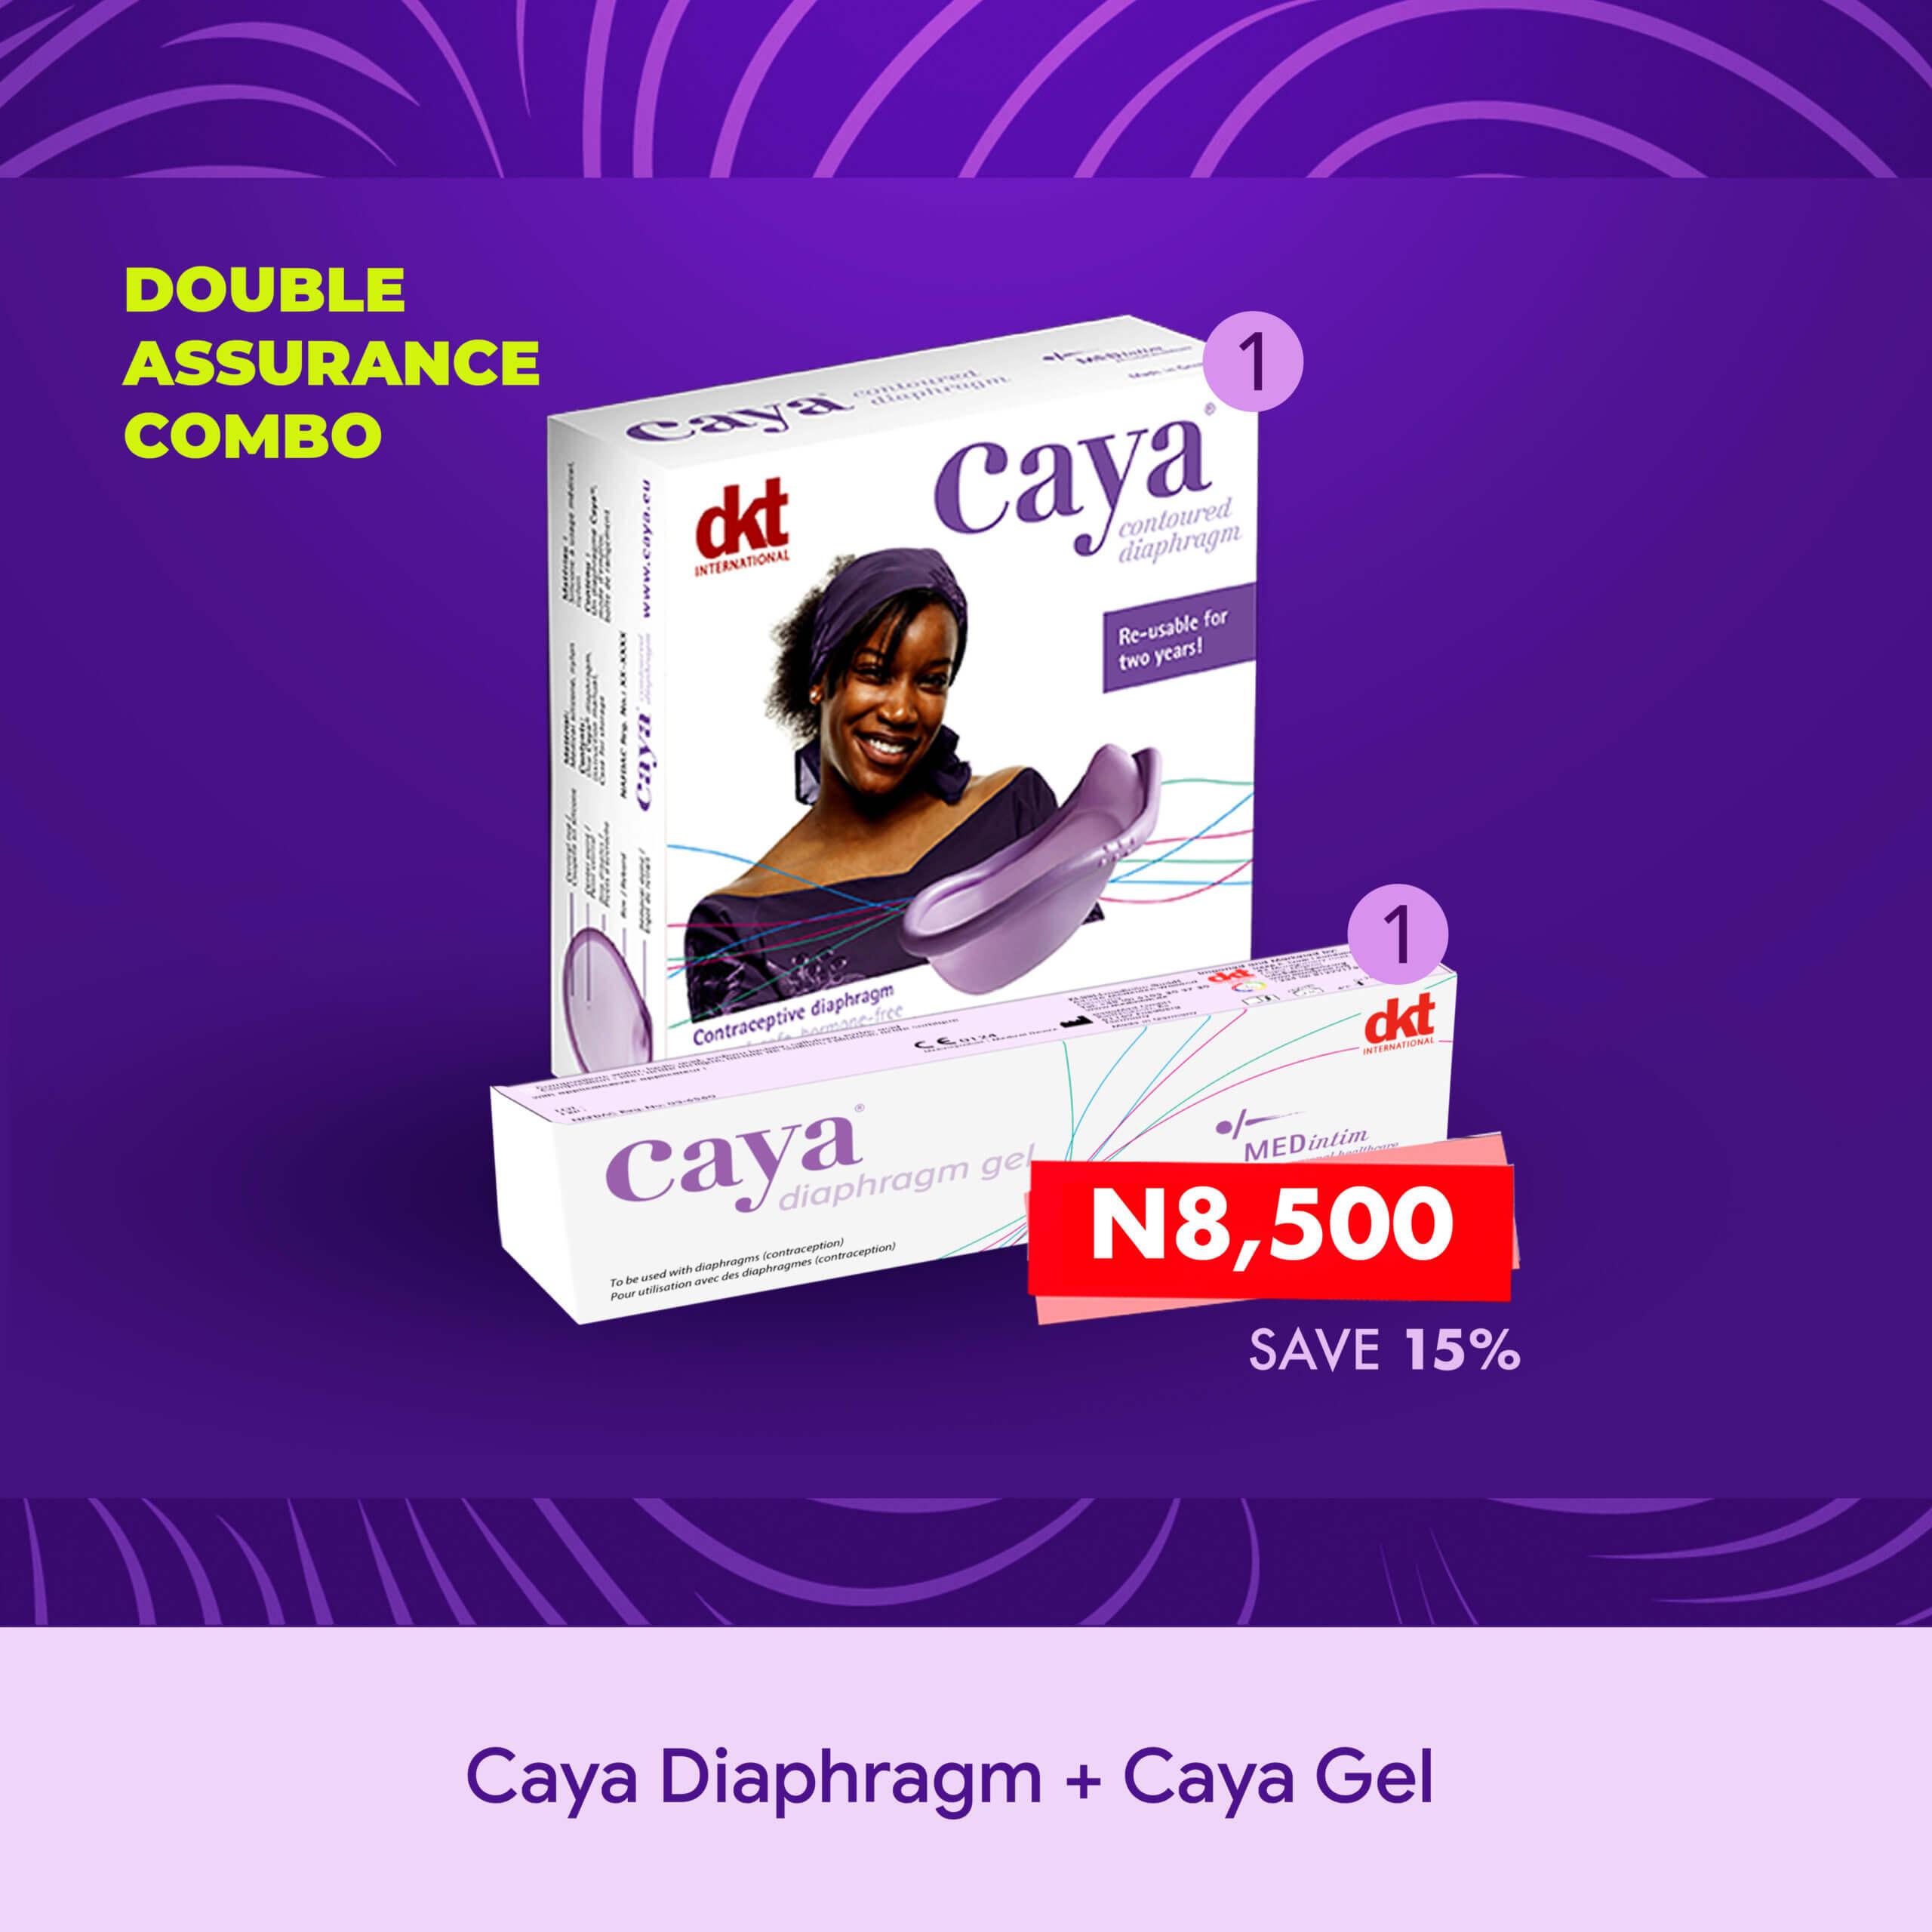 Caya Diaphragm + Gel (Double Assurance Combo)